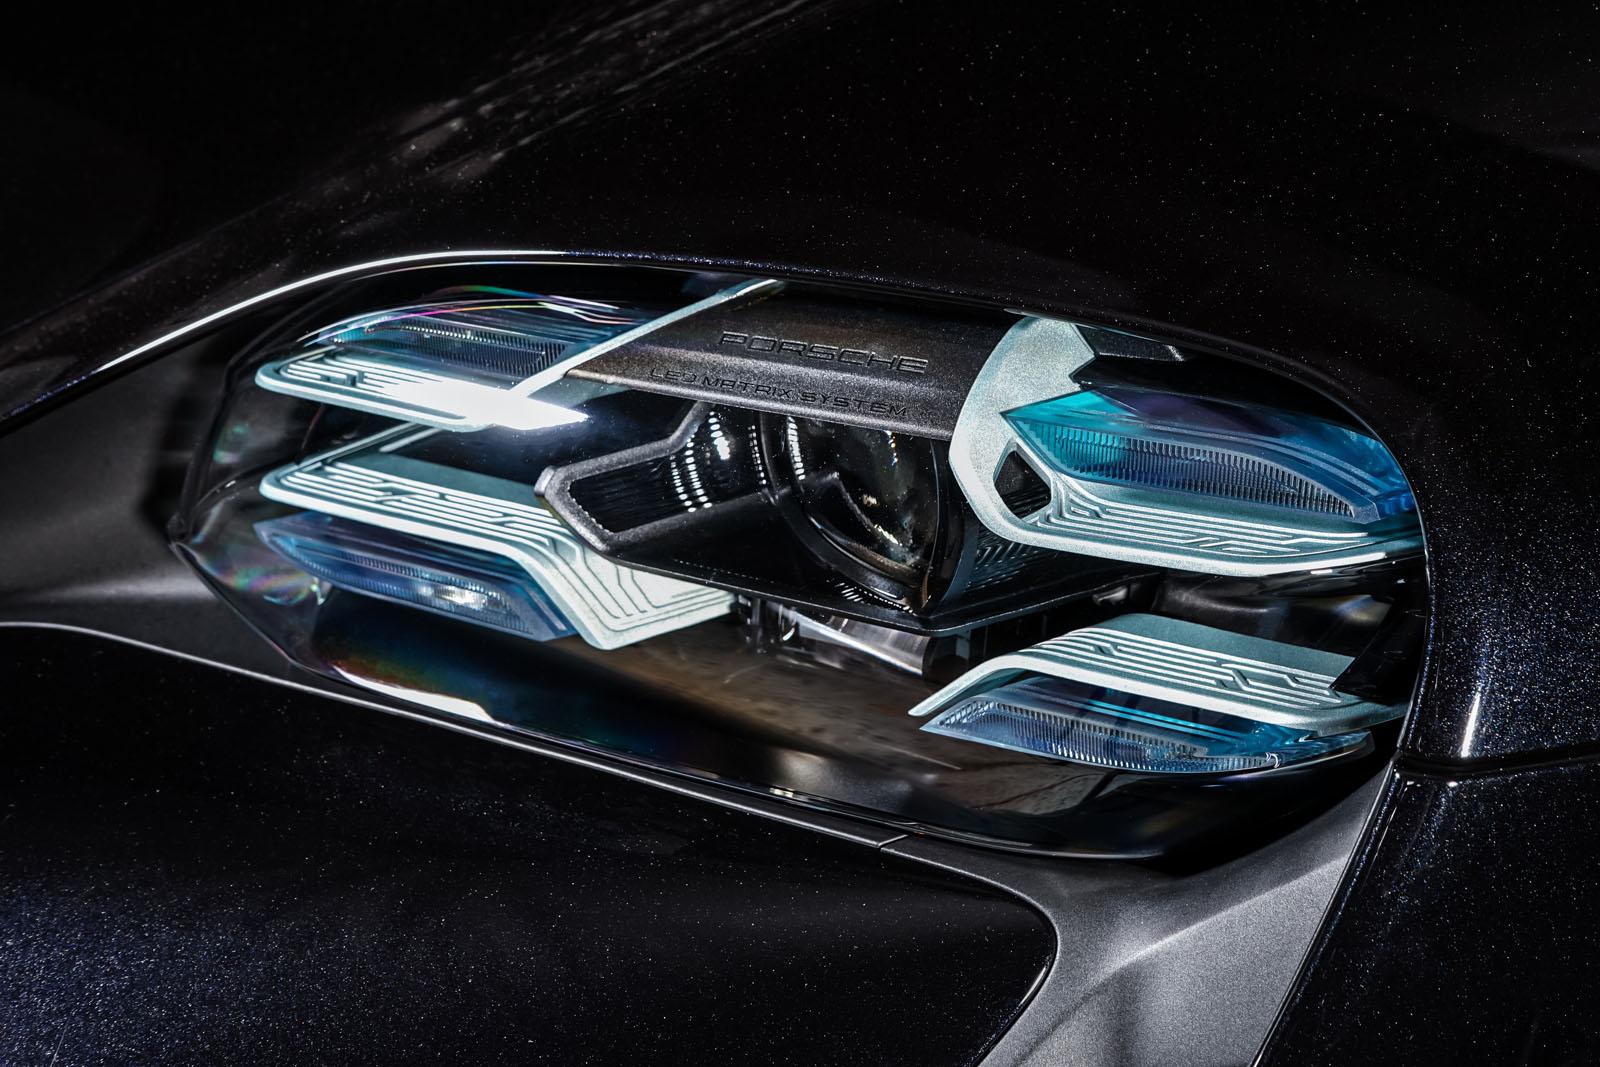 Porsche_Taycan_Turbo_Schwarz_Schwarz_POR-8106_13_w